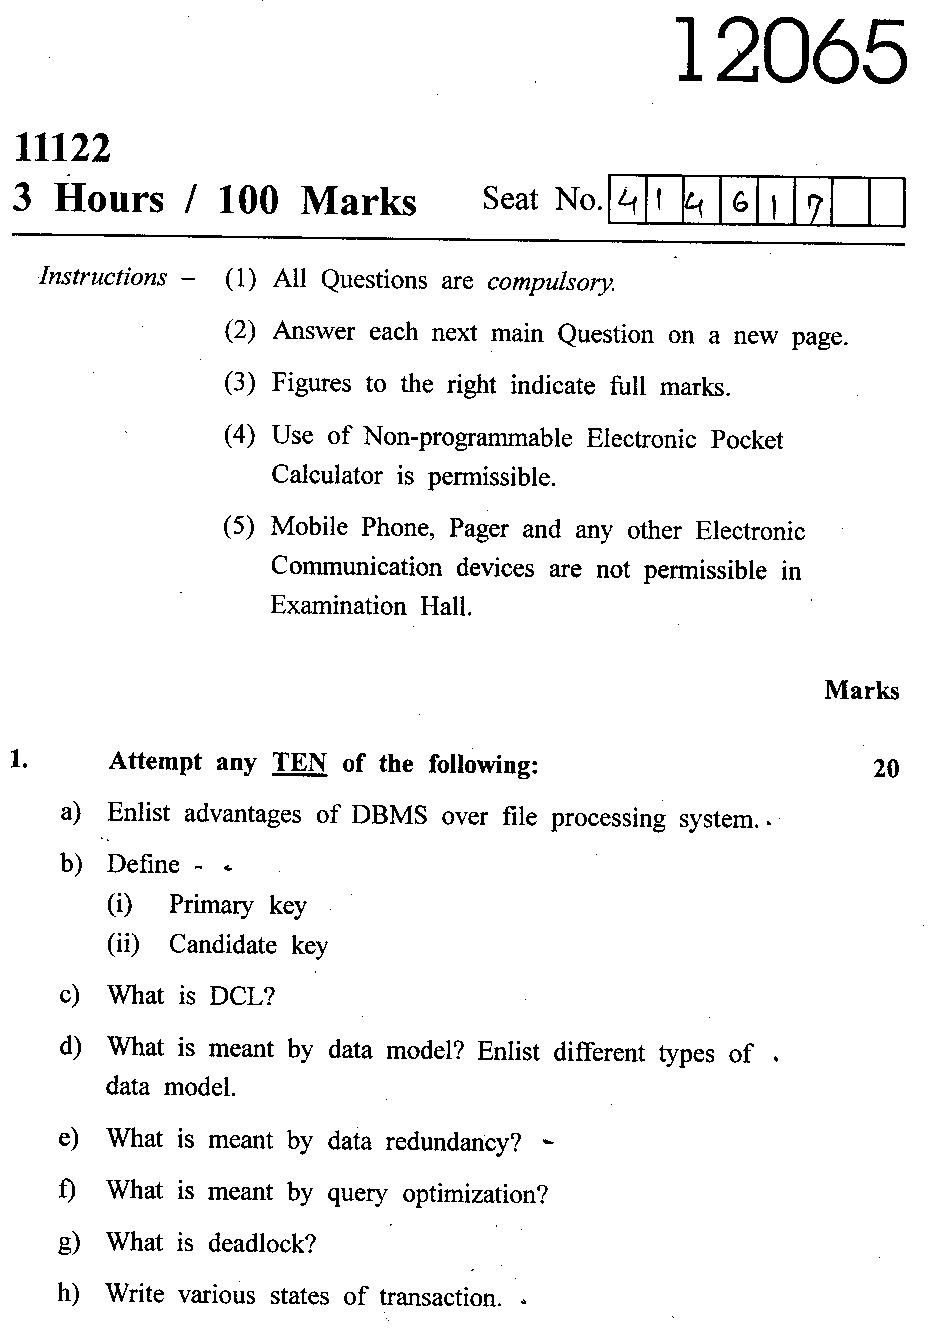 Engineering Management subject at university